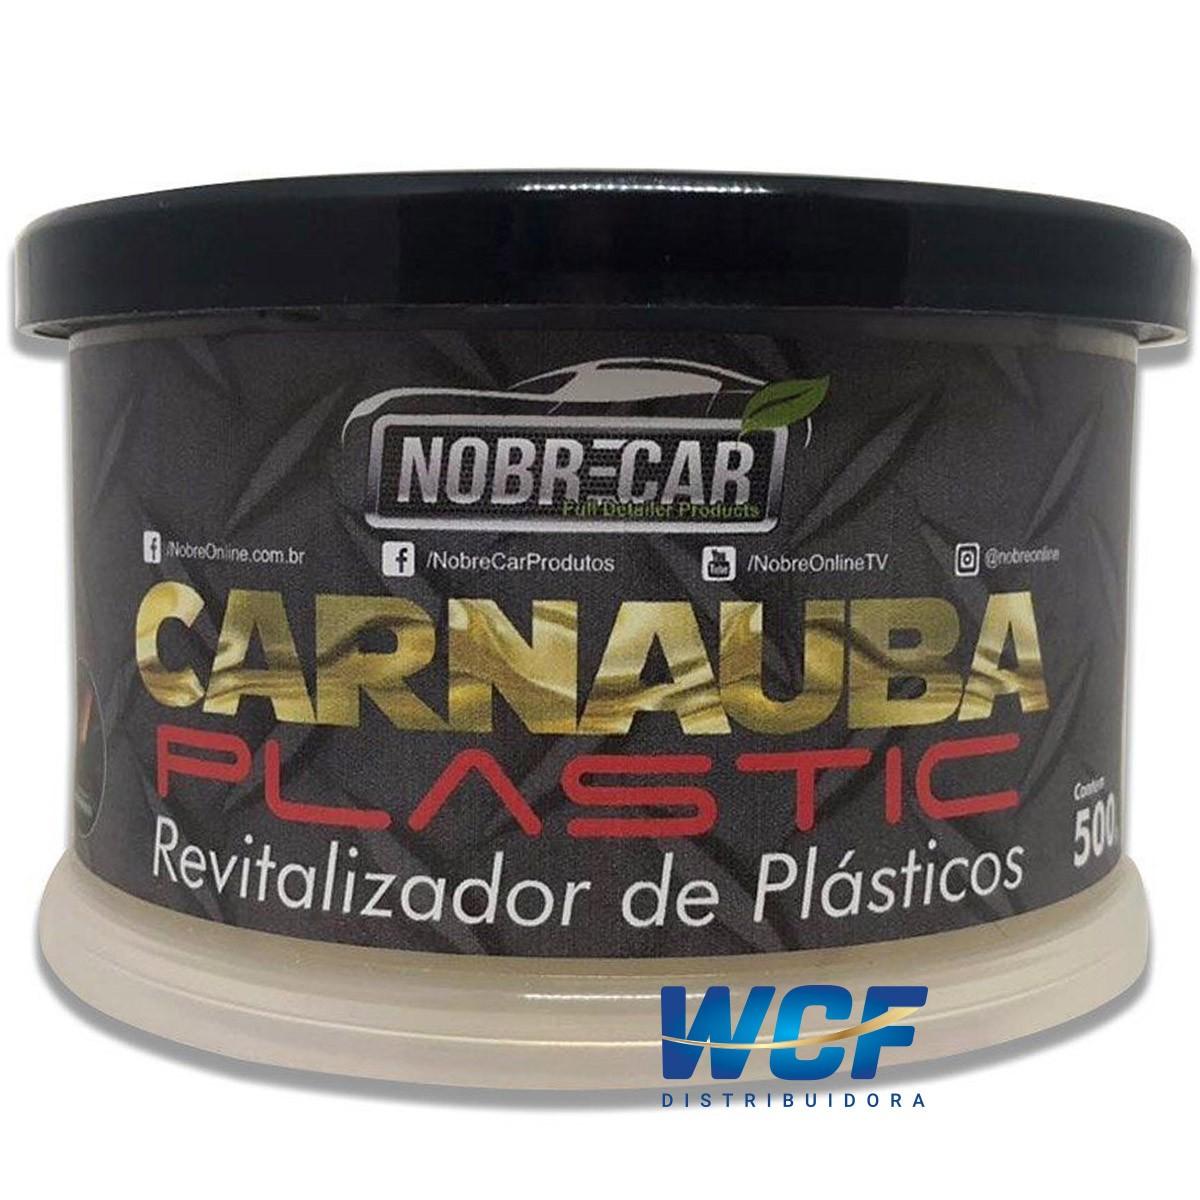 NOBRE CARNAUBA PLASTIC REVITALISADOR DE PLASTICOS 500G